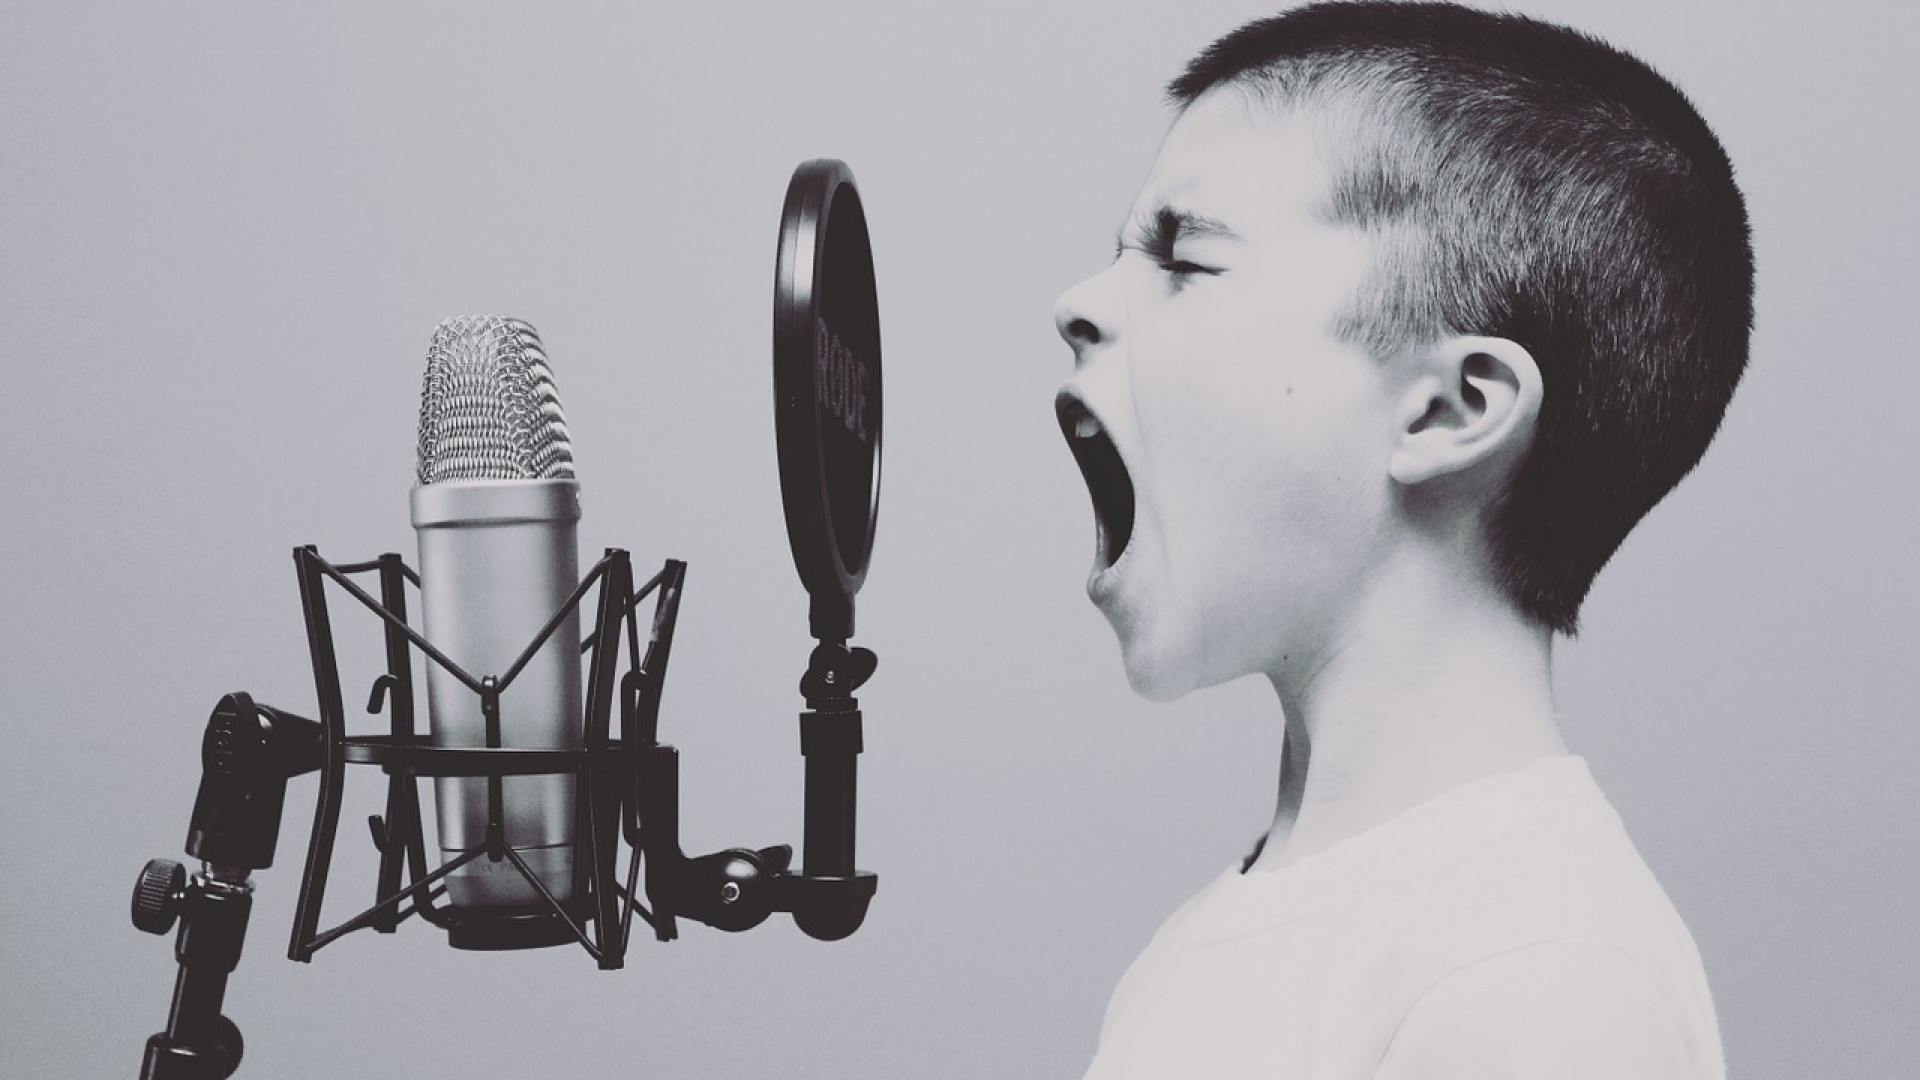 Comment travailler son rythme quand on chante ?